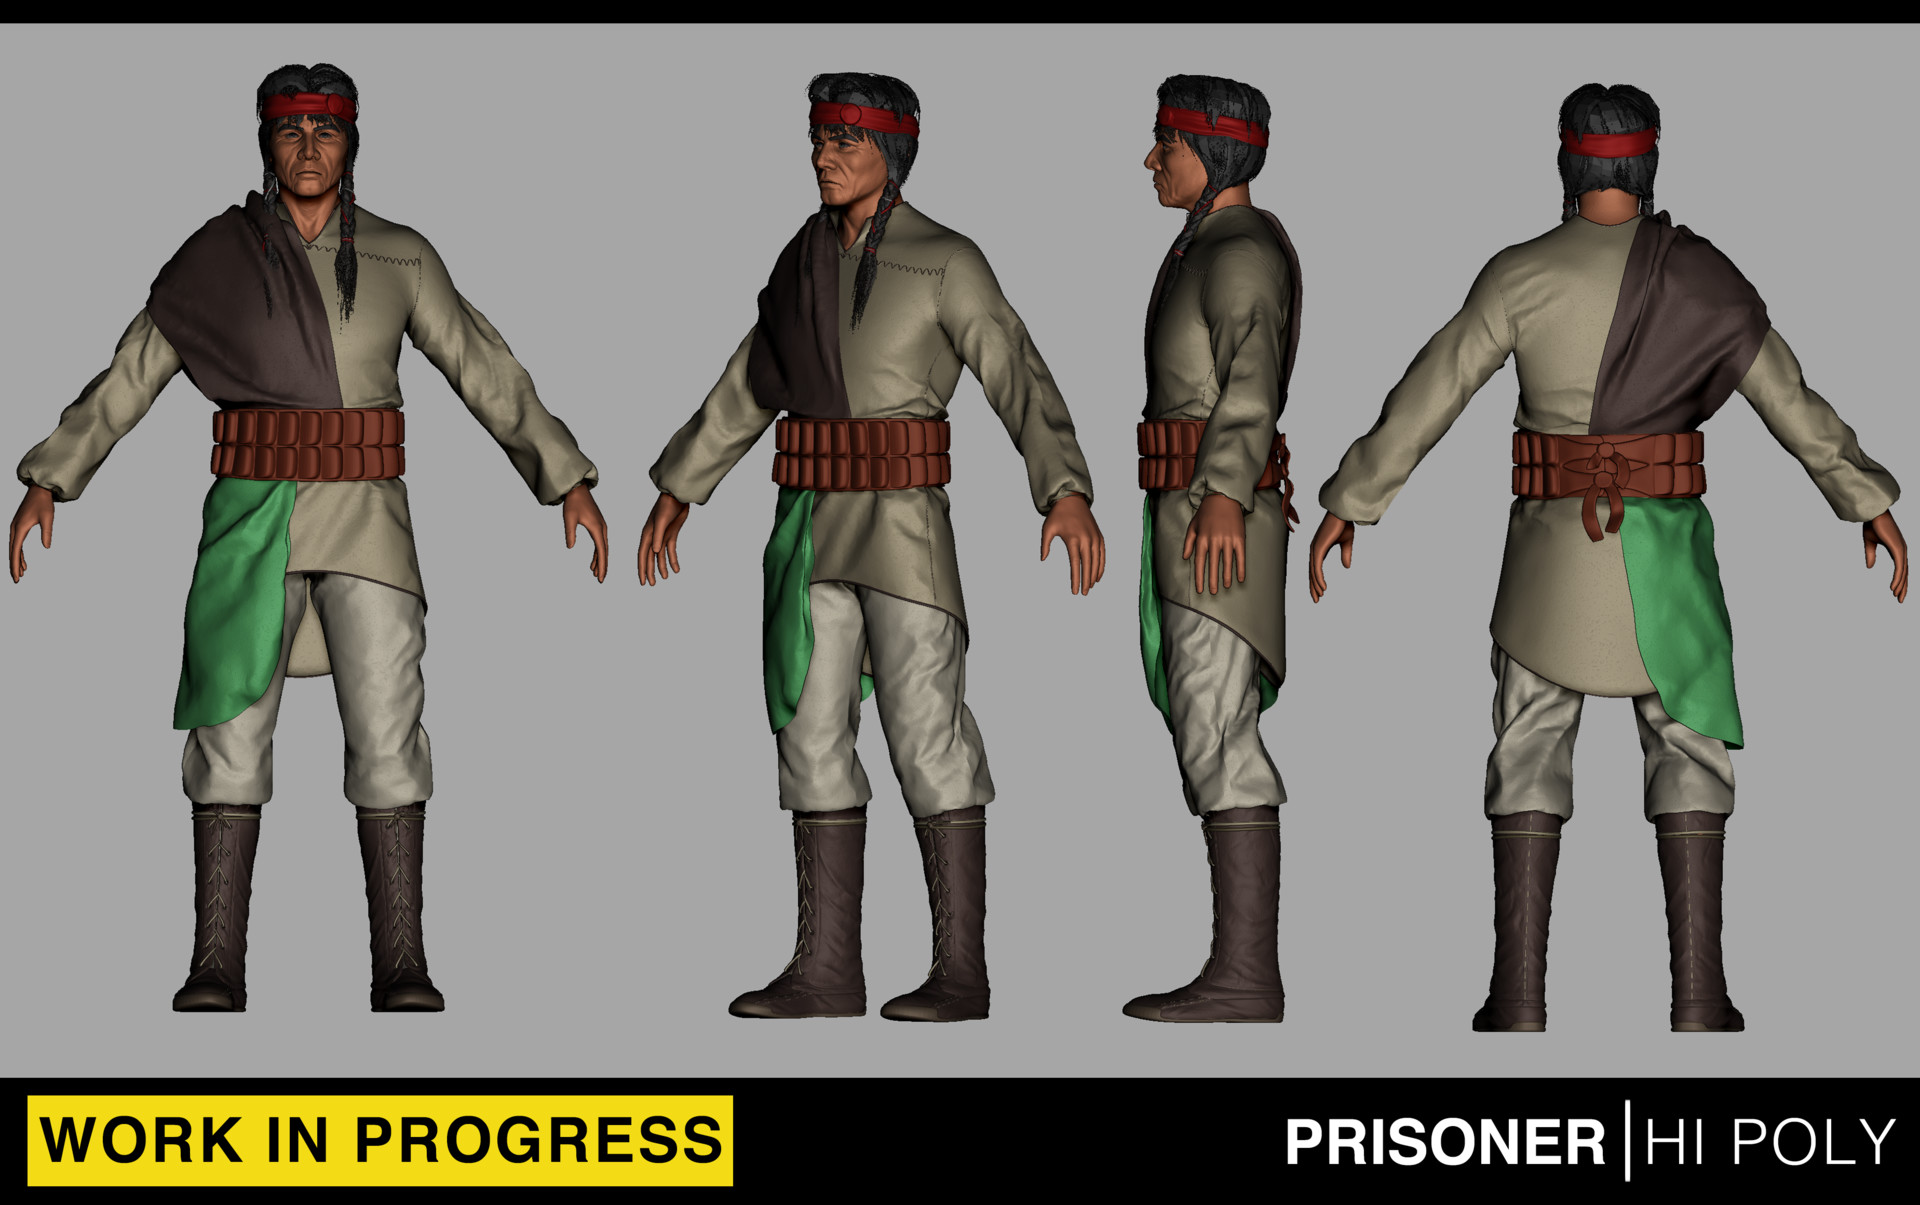 Cameron craig presentimage mprisoner01